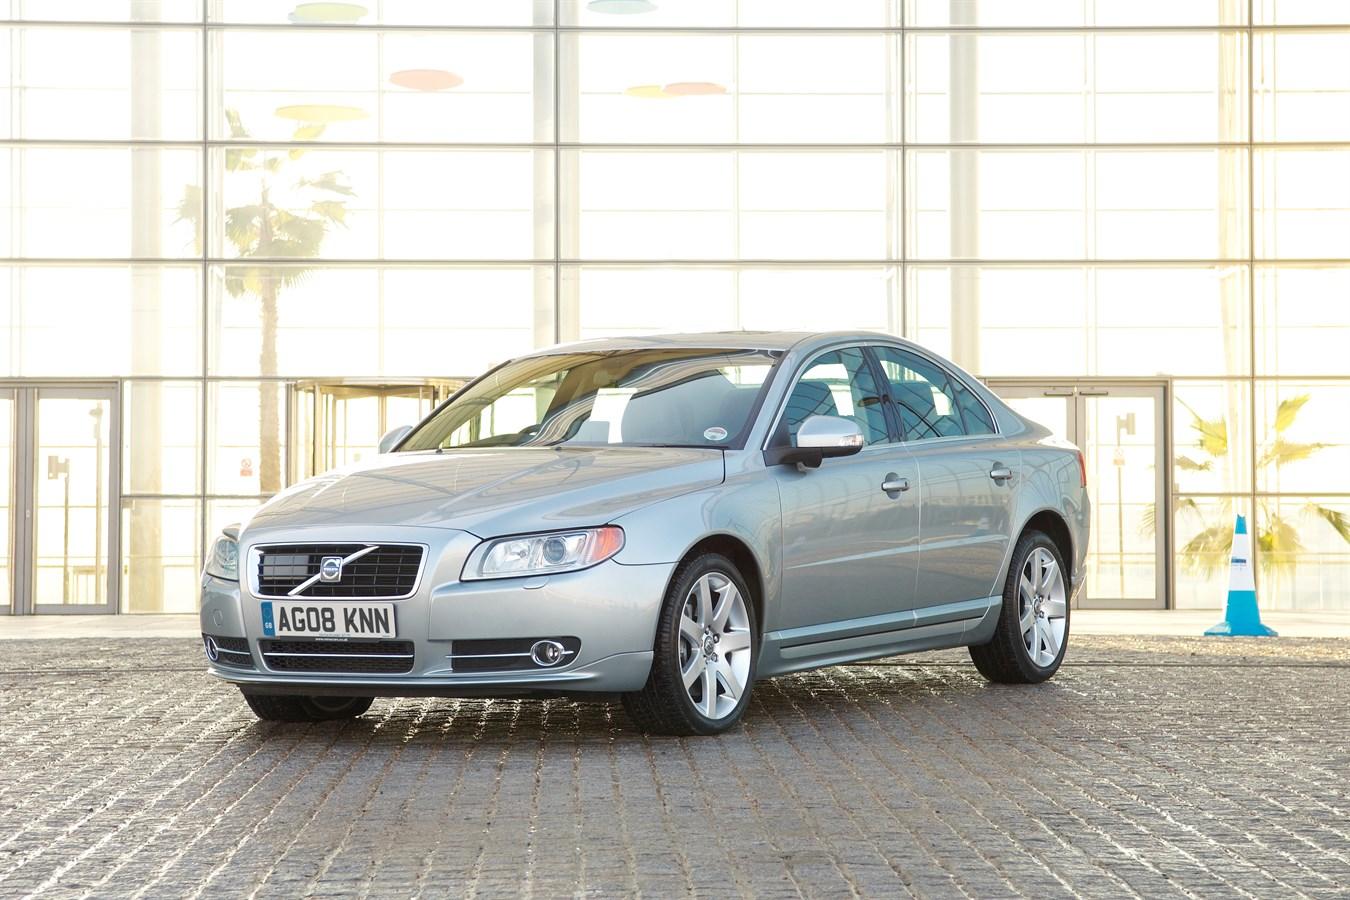 Volvo S80 Model Year 2009 Car Uk Media Newsroom 2001 Oxygen Sensor Location